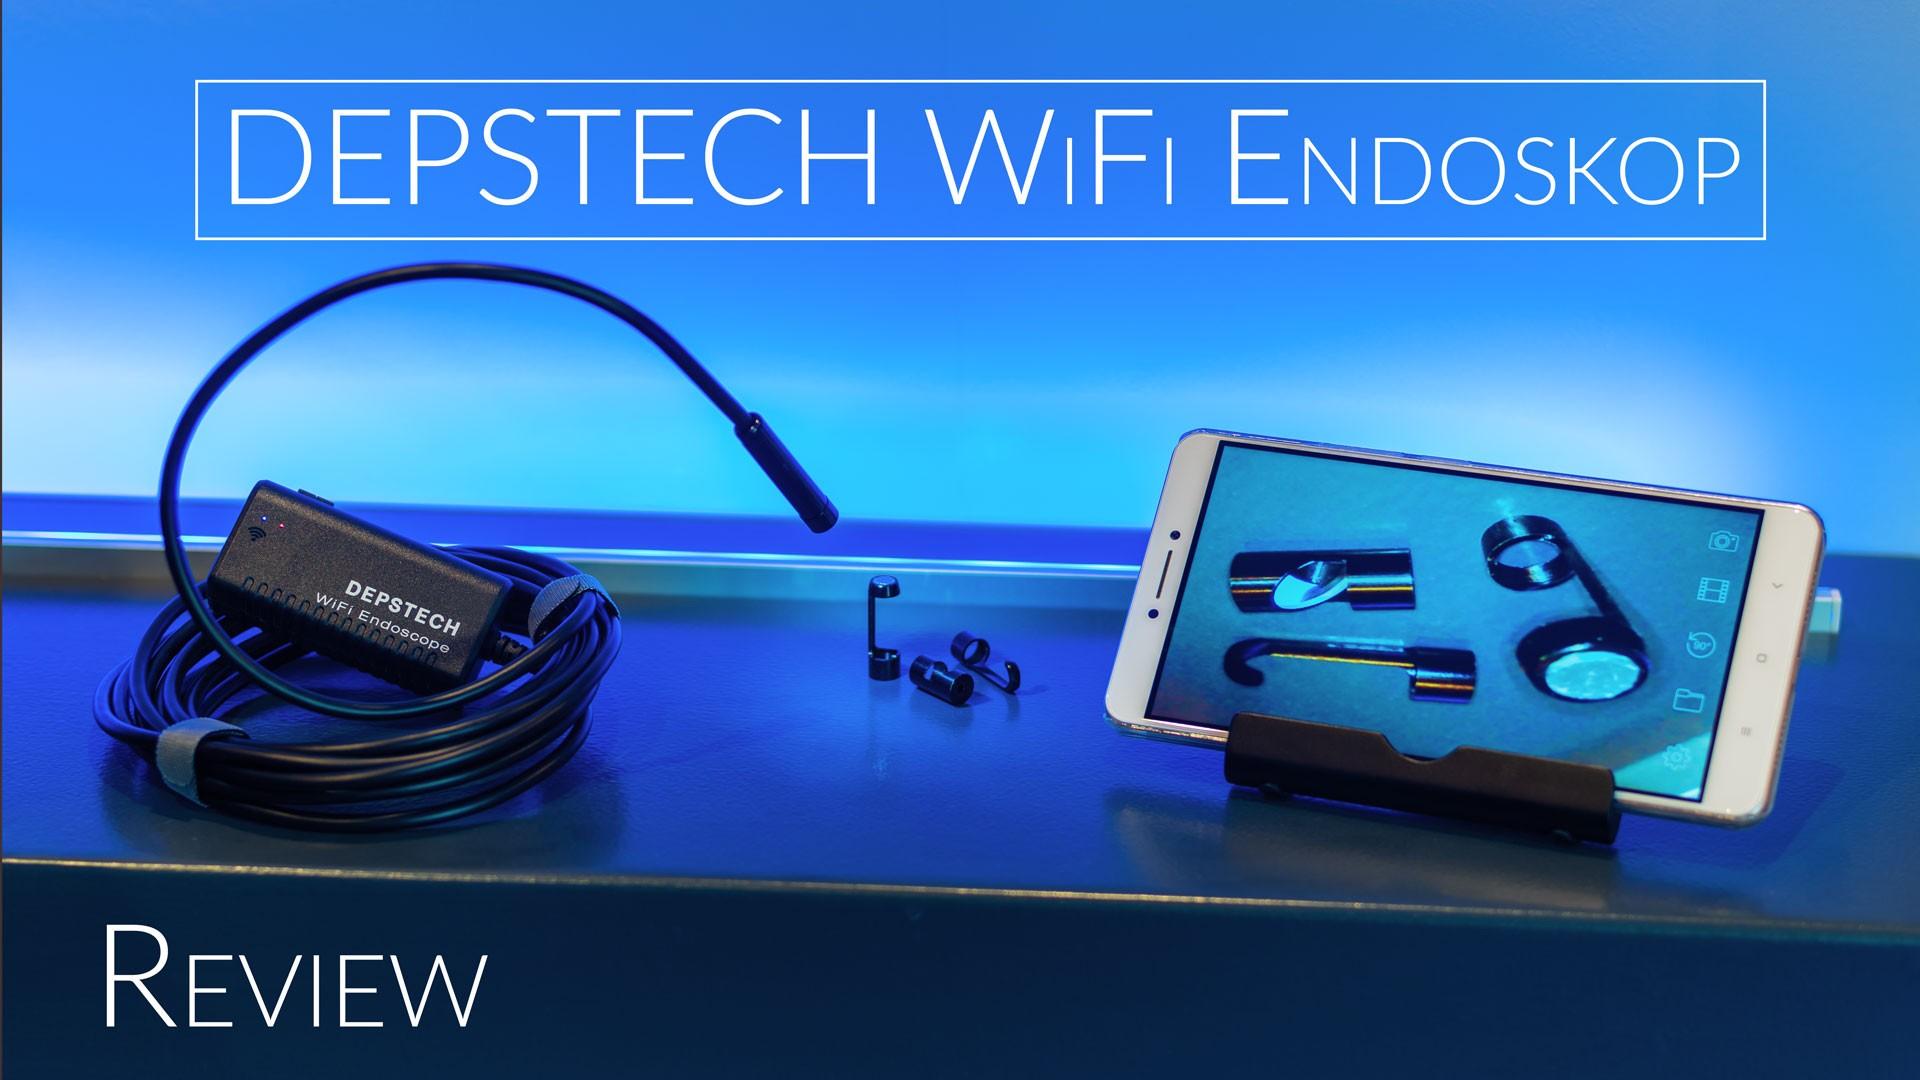 Kabelloses WiFi Endoskop